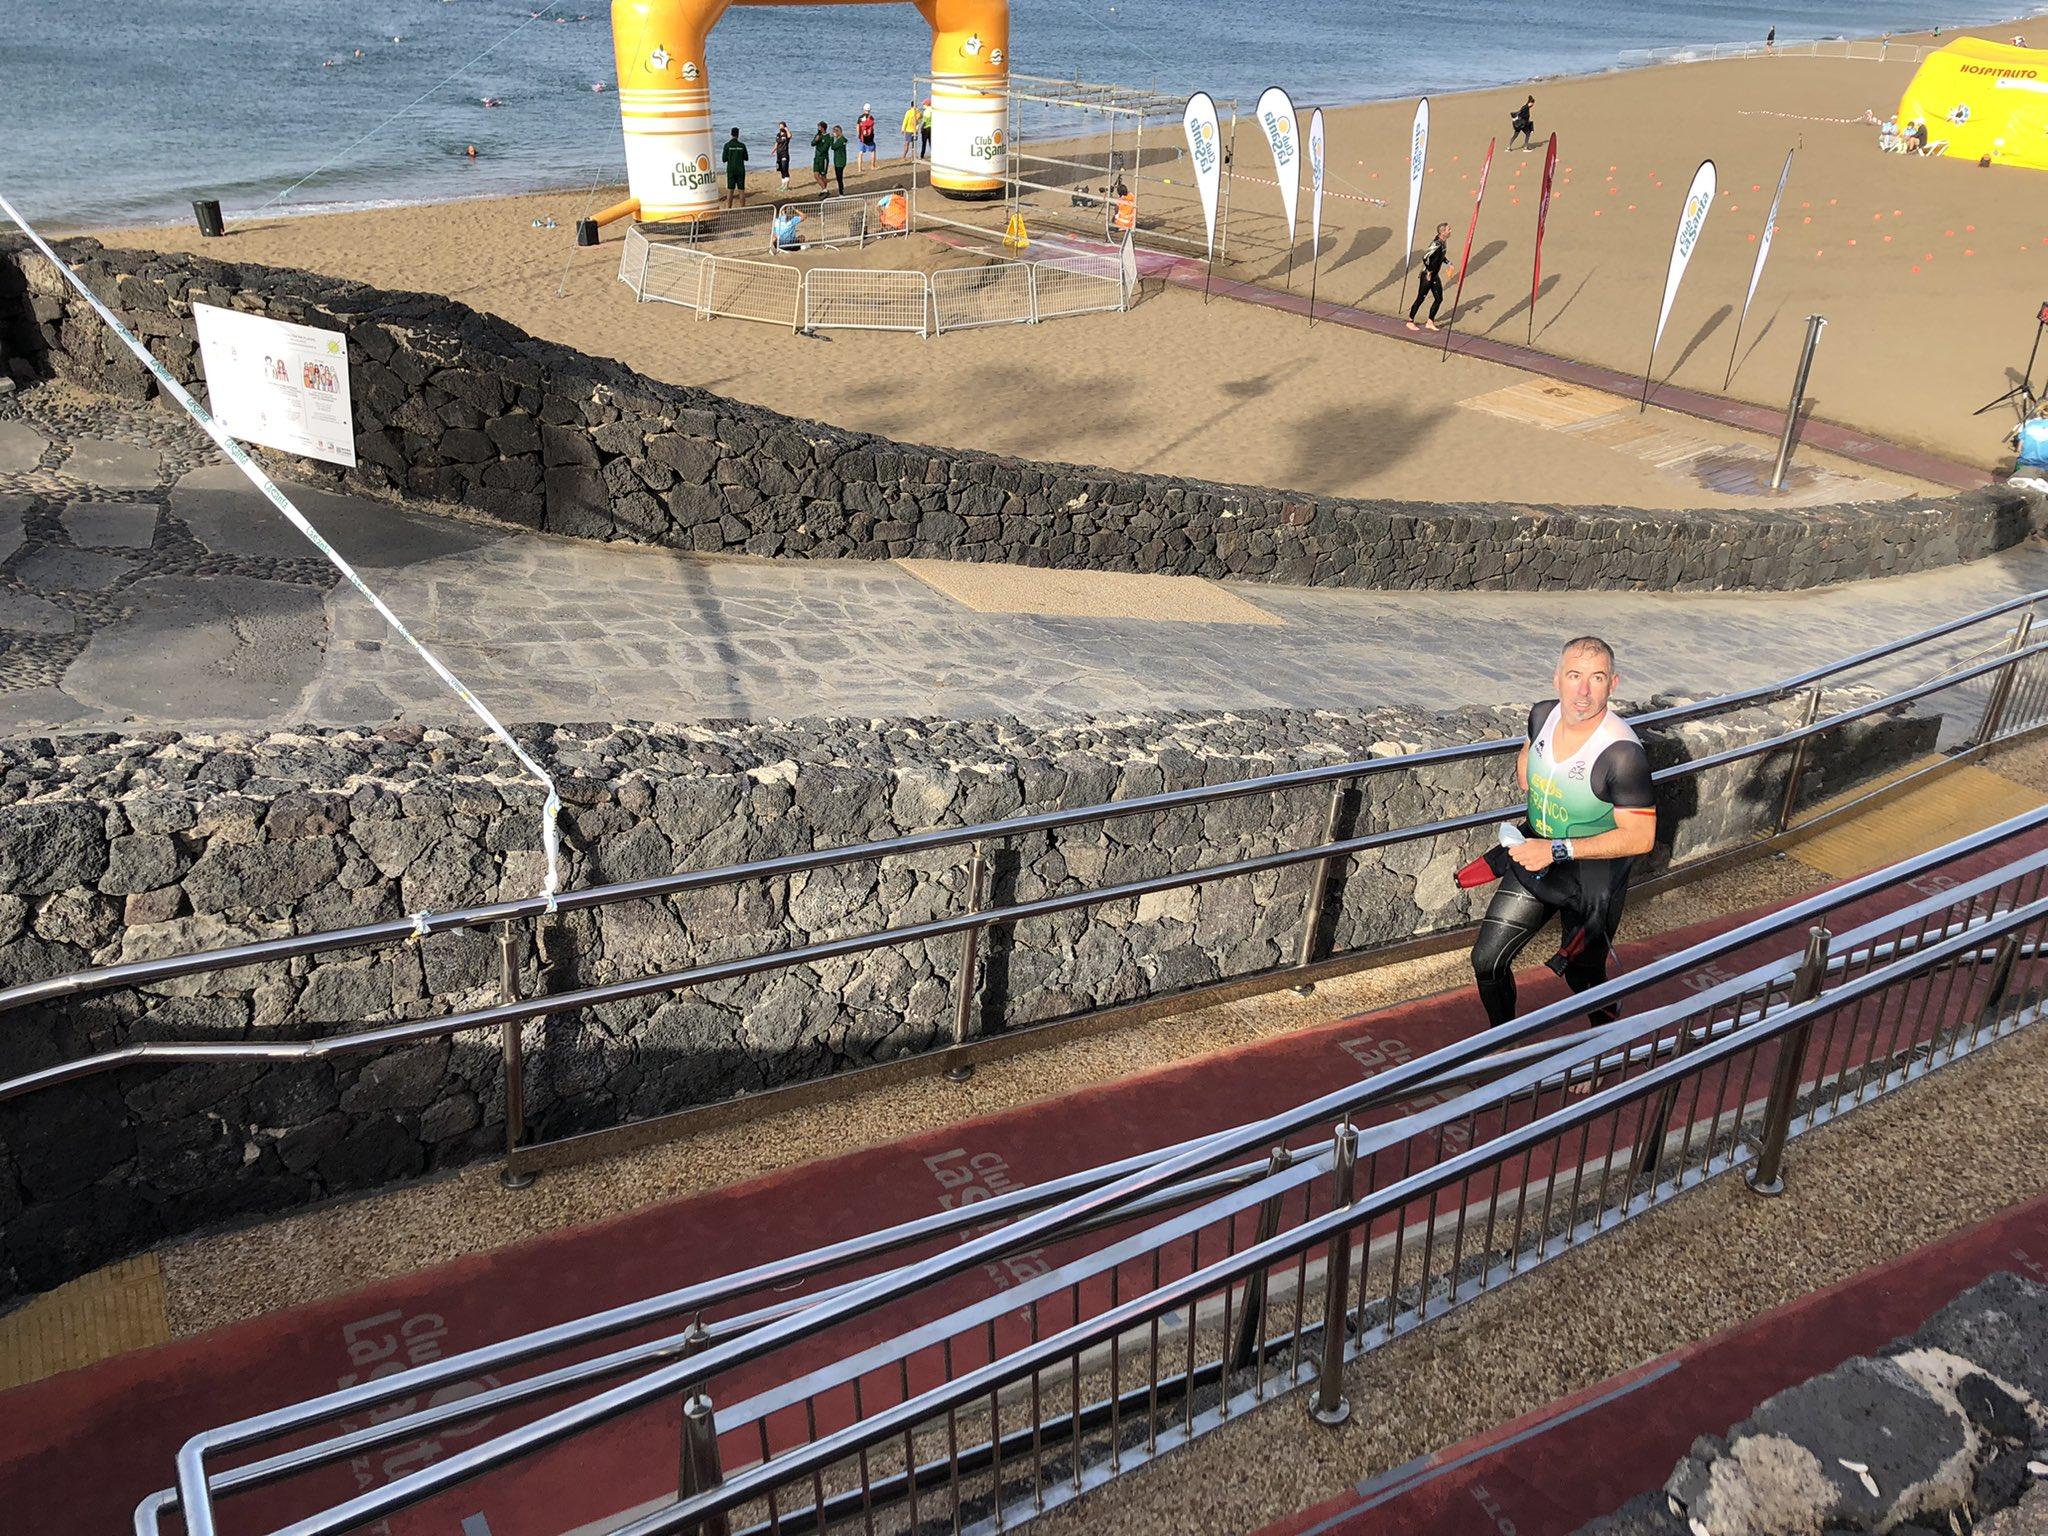 Toni Franco Salas Ironman de Lanzarote